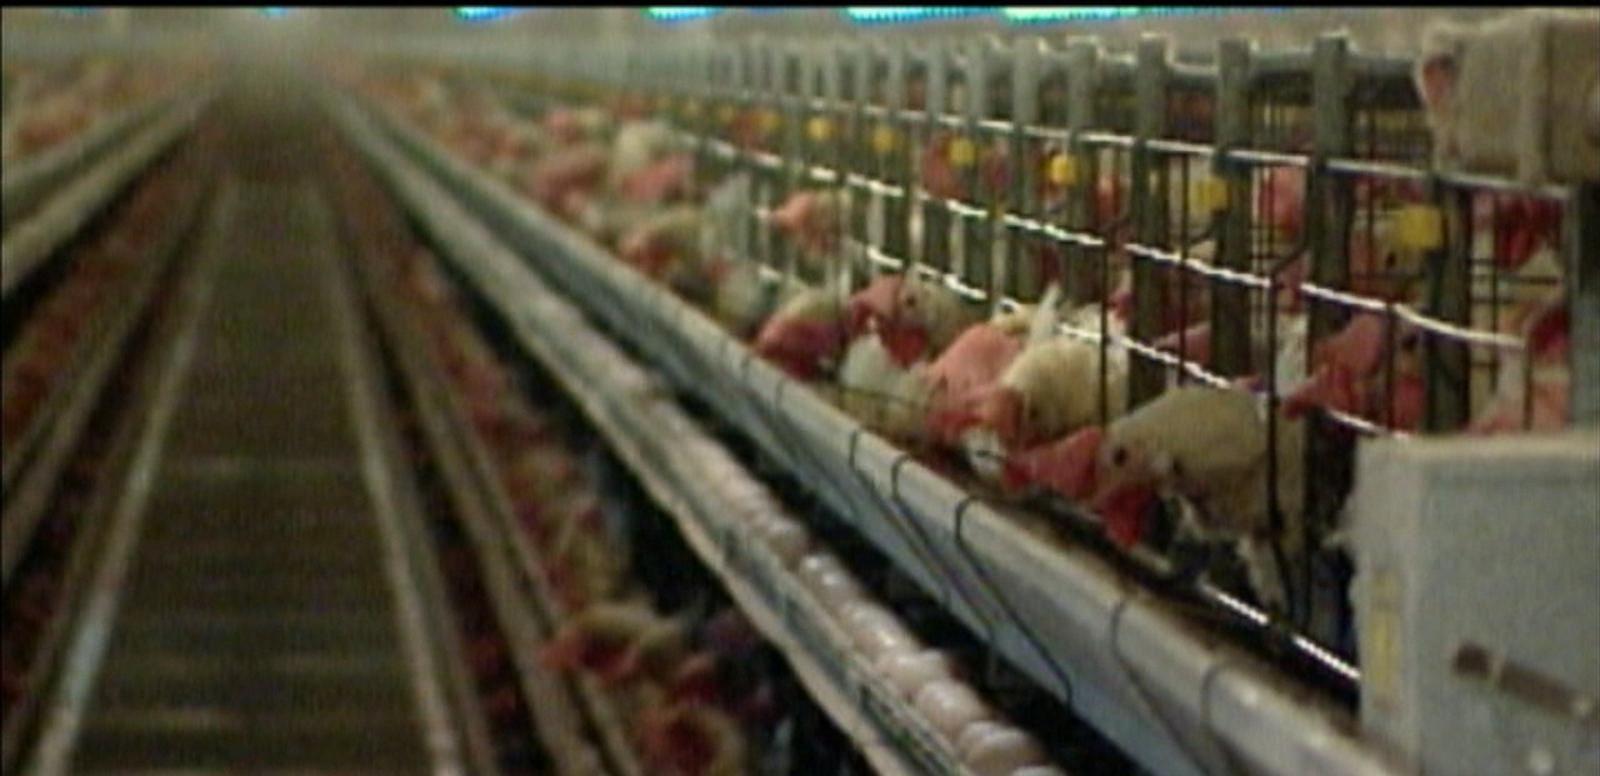 VIDEO: Bird Flu Outbreak Strikes Iowa